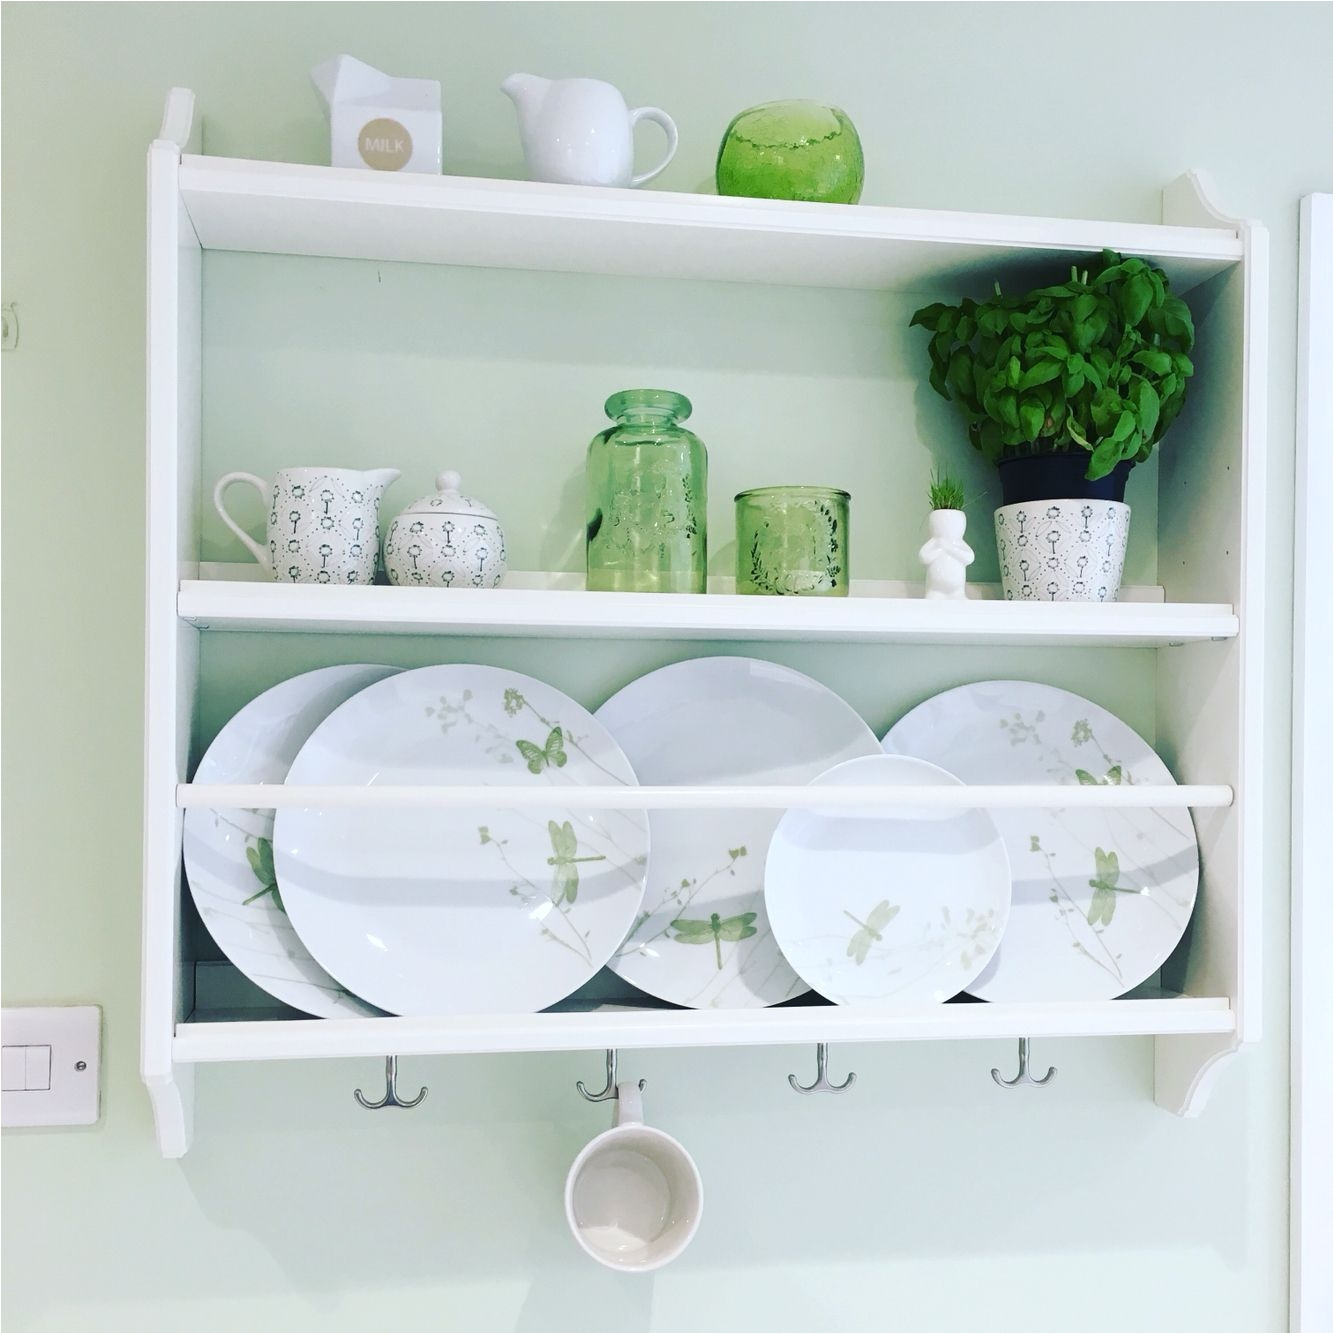 stenstorp ikea plate rack in a green and white kitchen shelfie shelf love